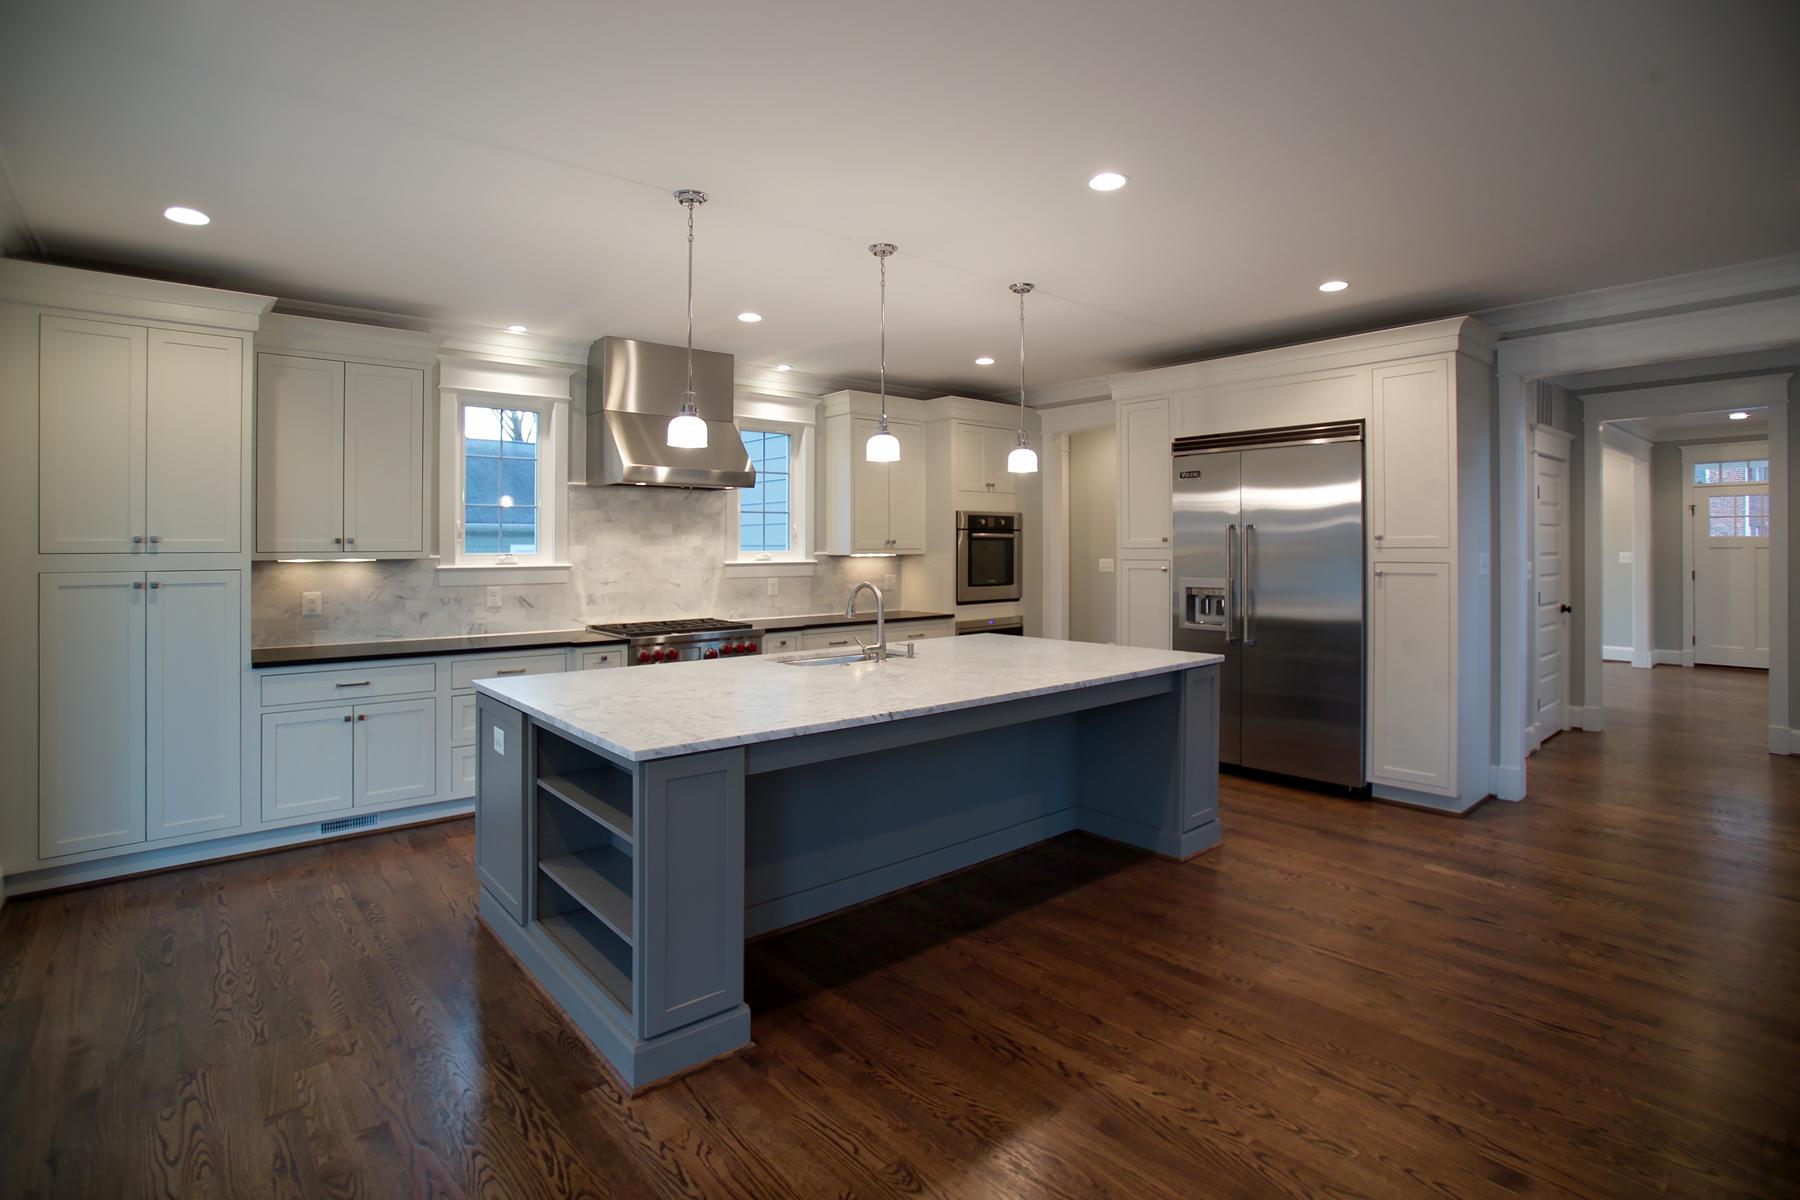 Kitchen 1 - Overall View.jpg